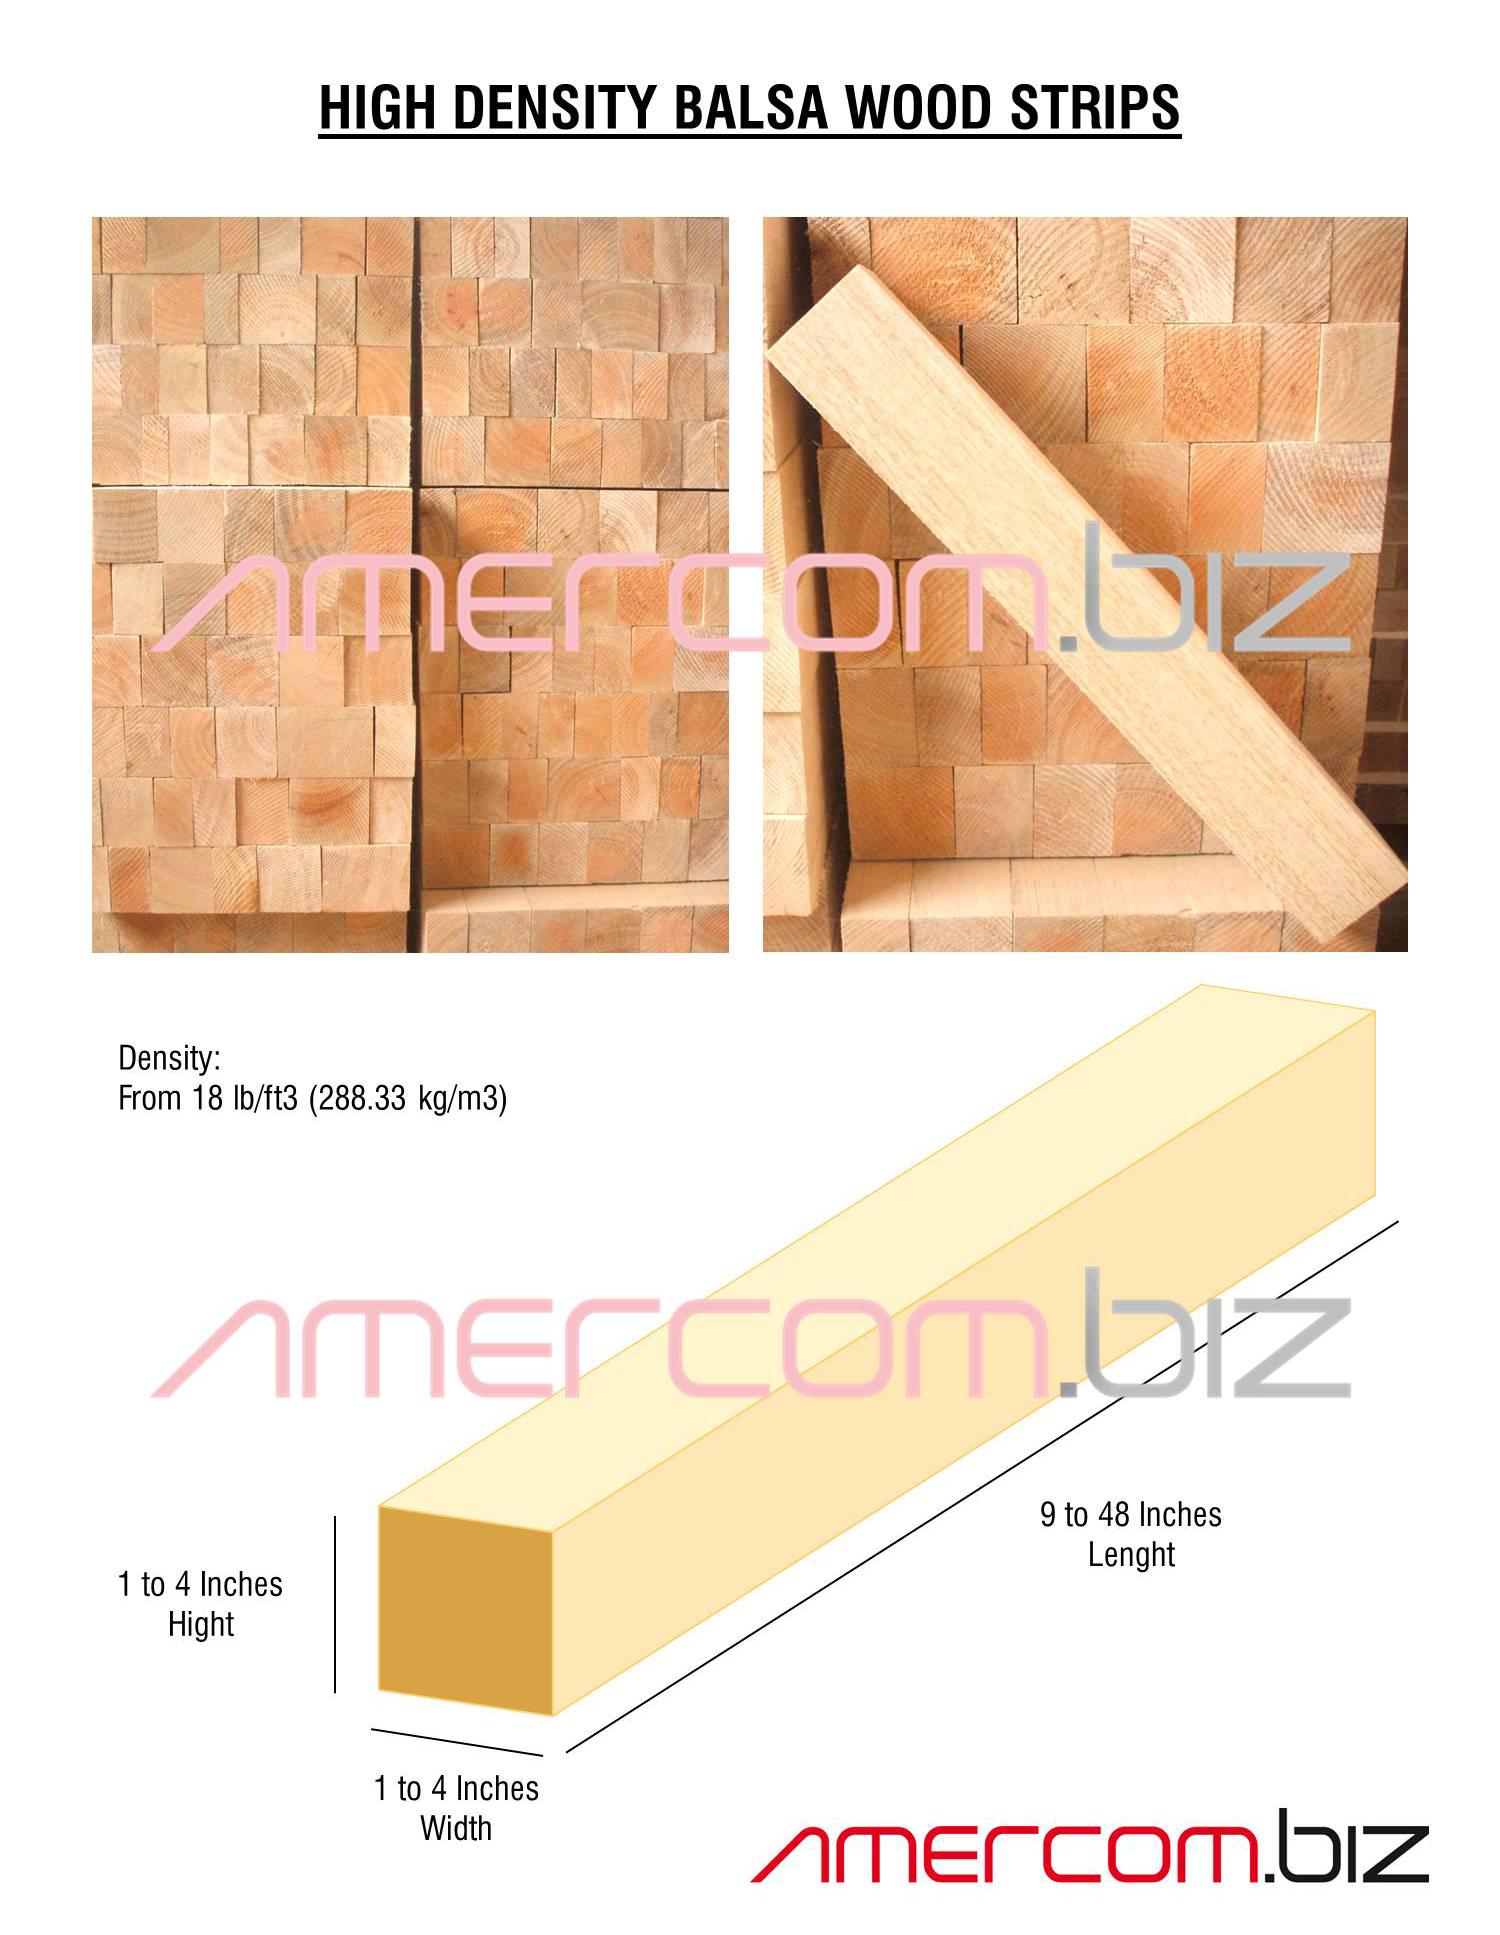 High Density Balsa Wood Strips